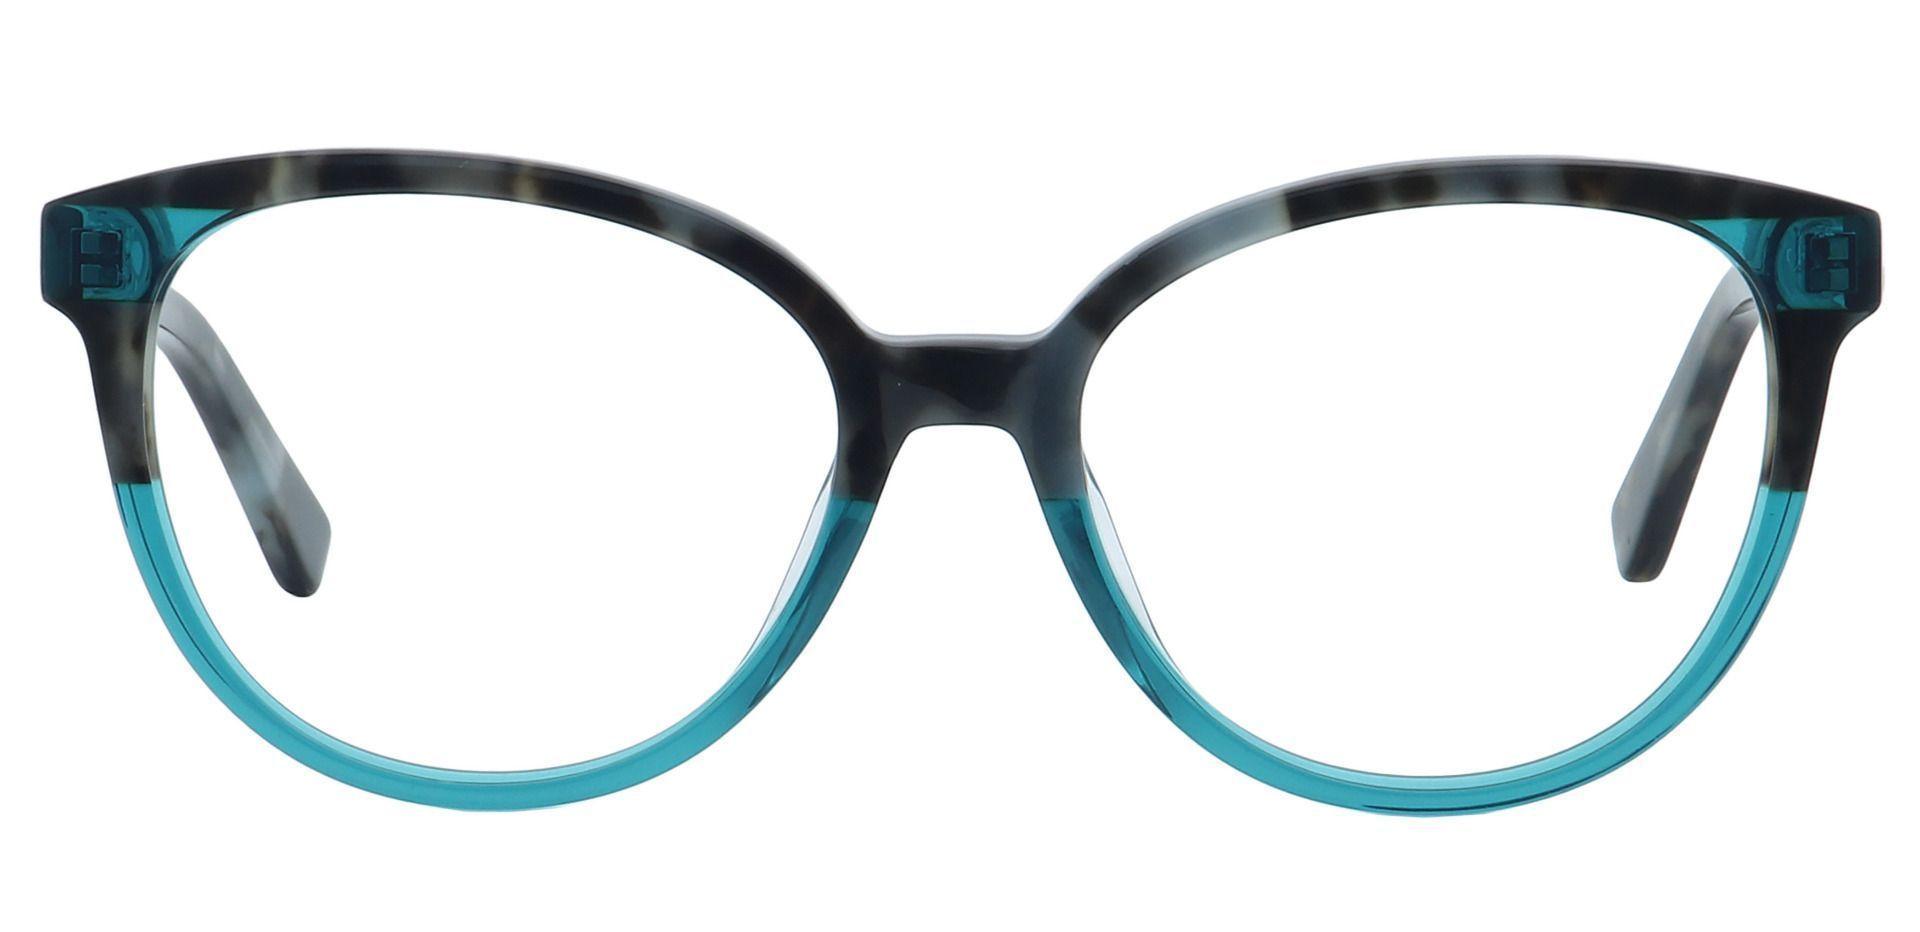 Francesca Oval Prescription Glasses - Gray